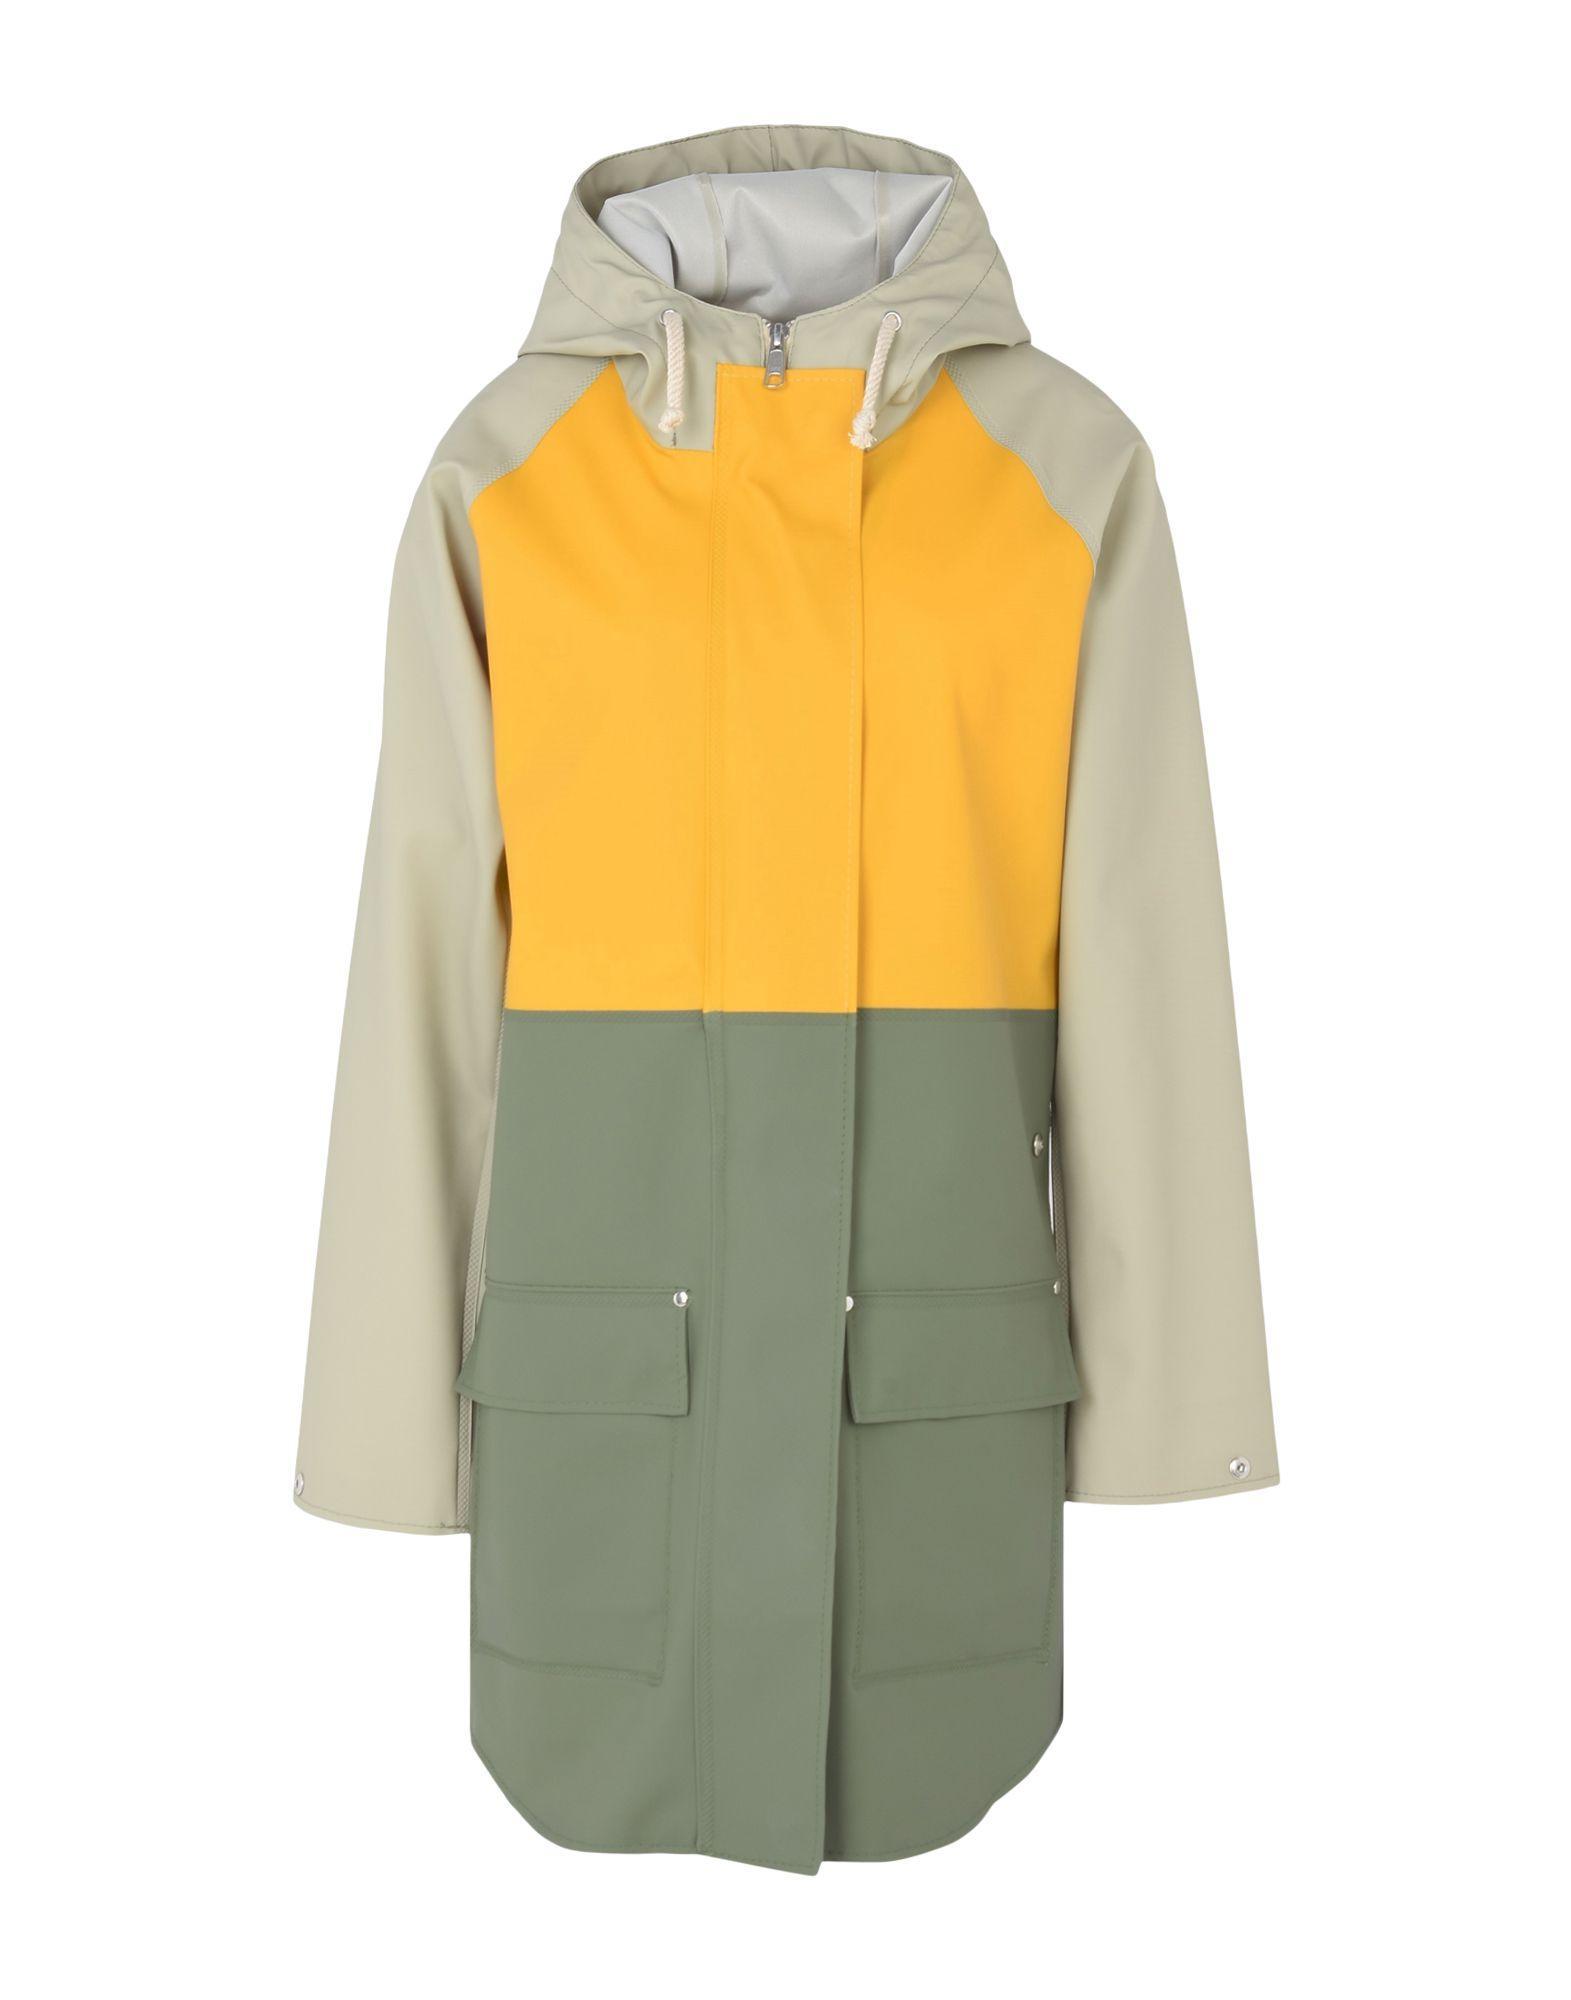 Elka Jackets In Yellow